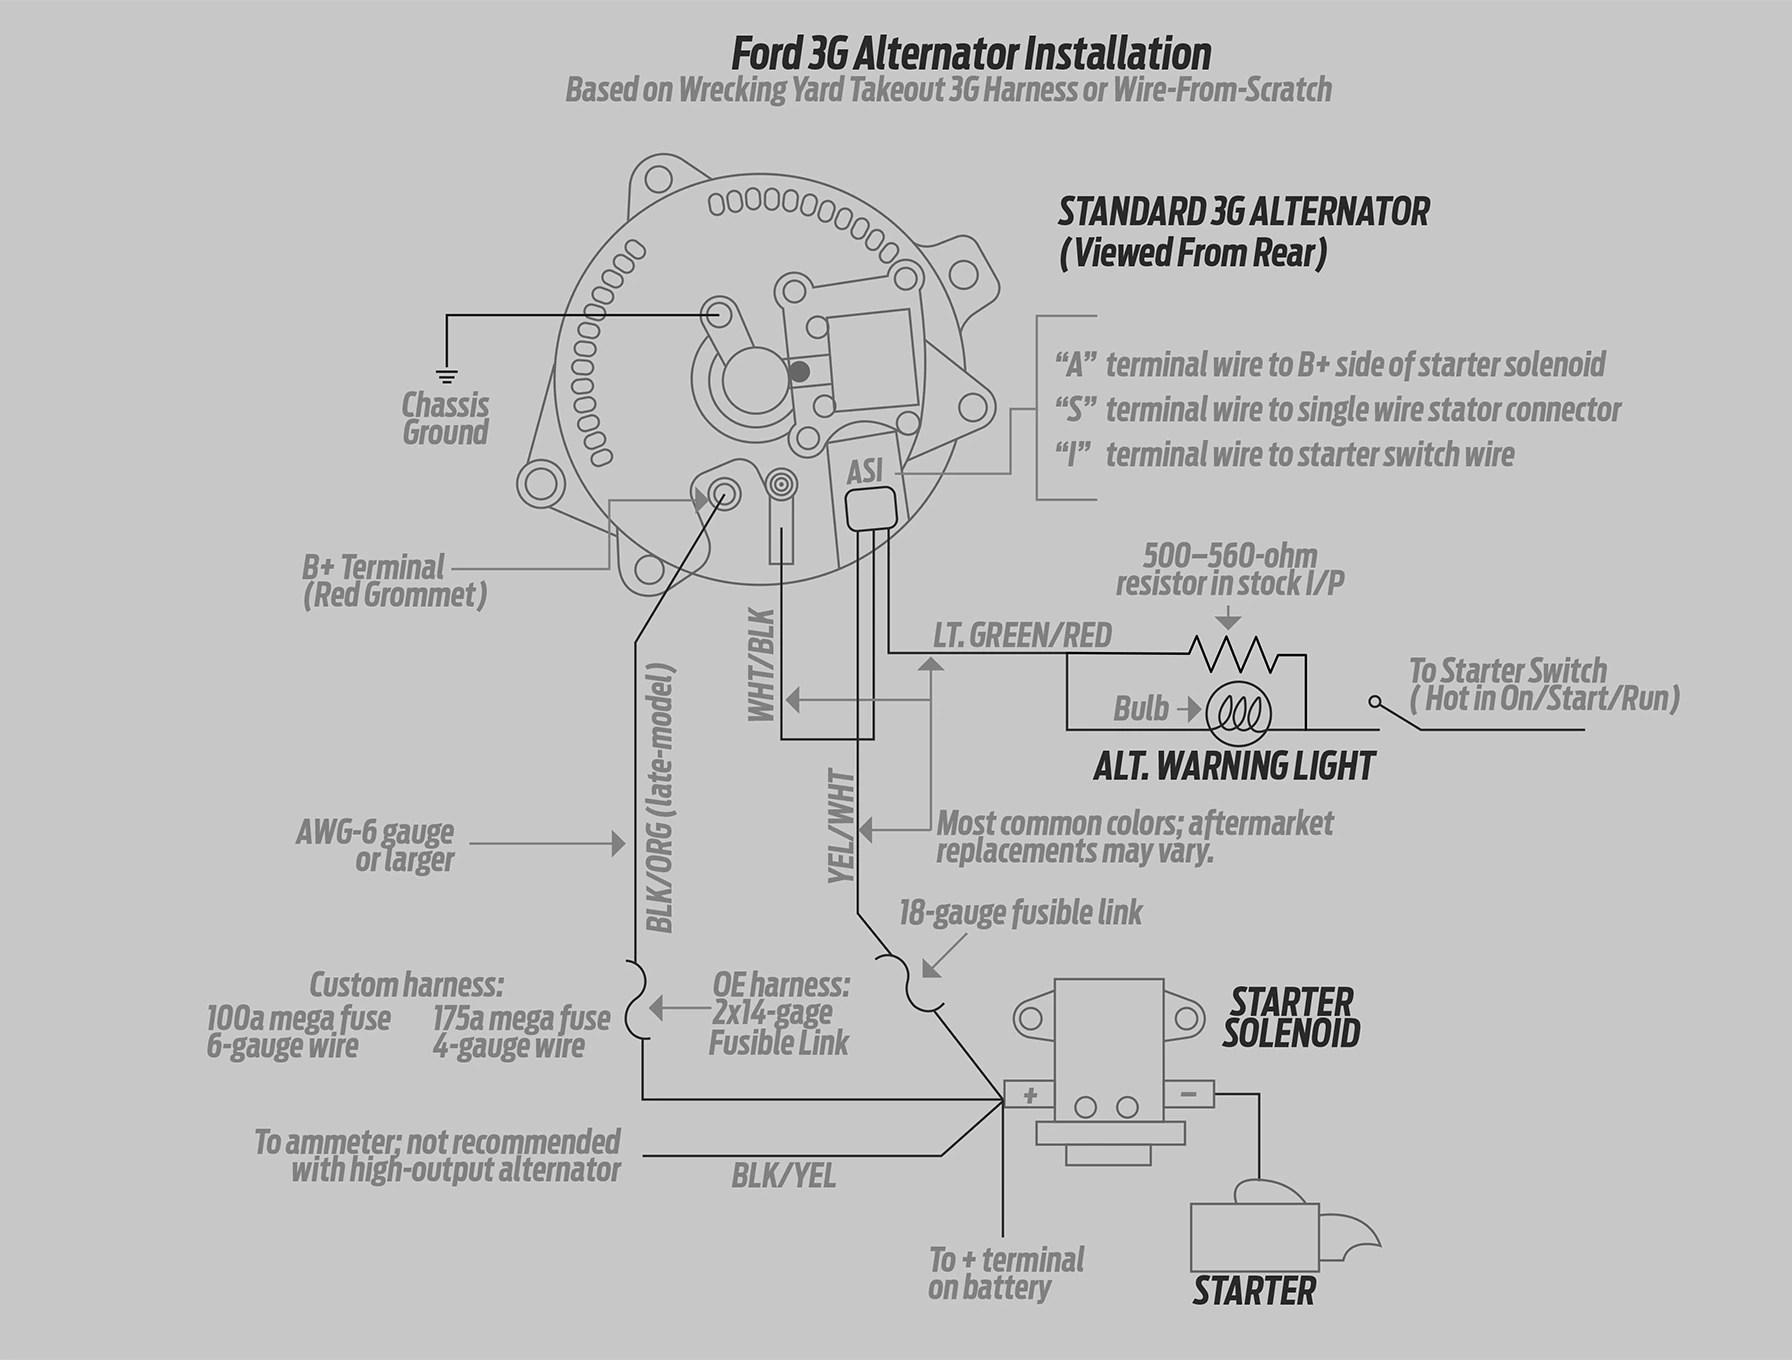 small resolution of ford 3g alternator wiring wiring diagram details ford 3g alternator wiring harness